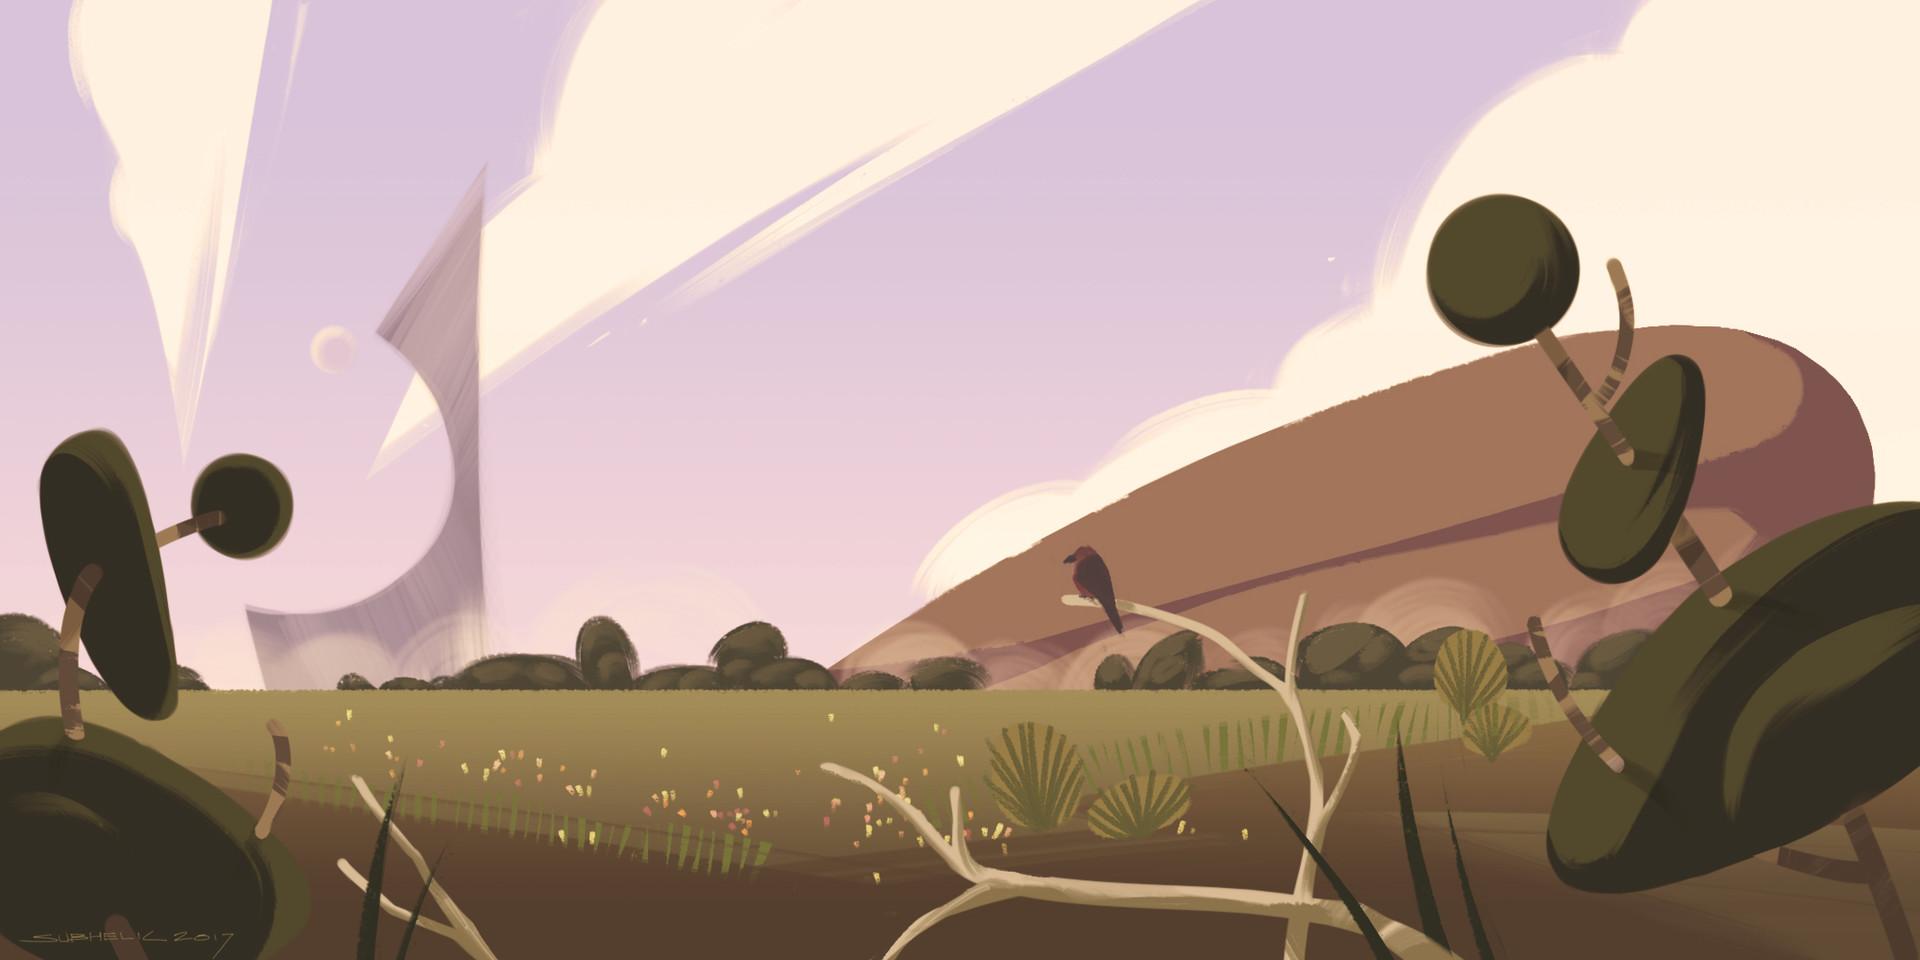 Subhelic strange field